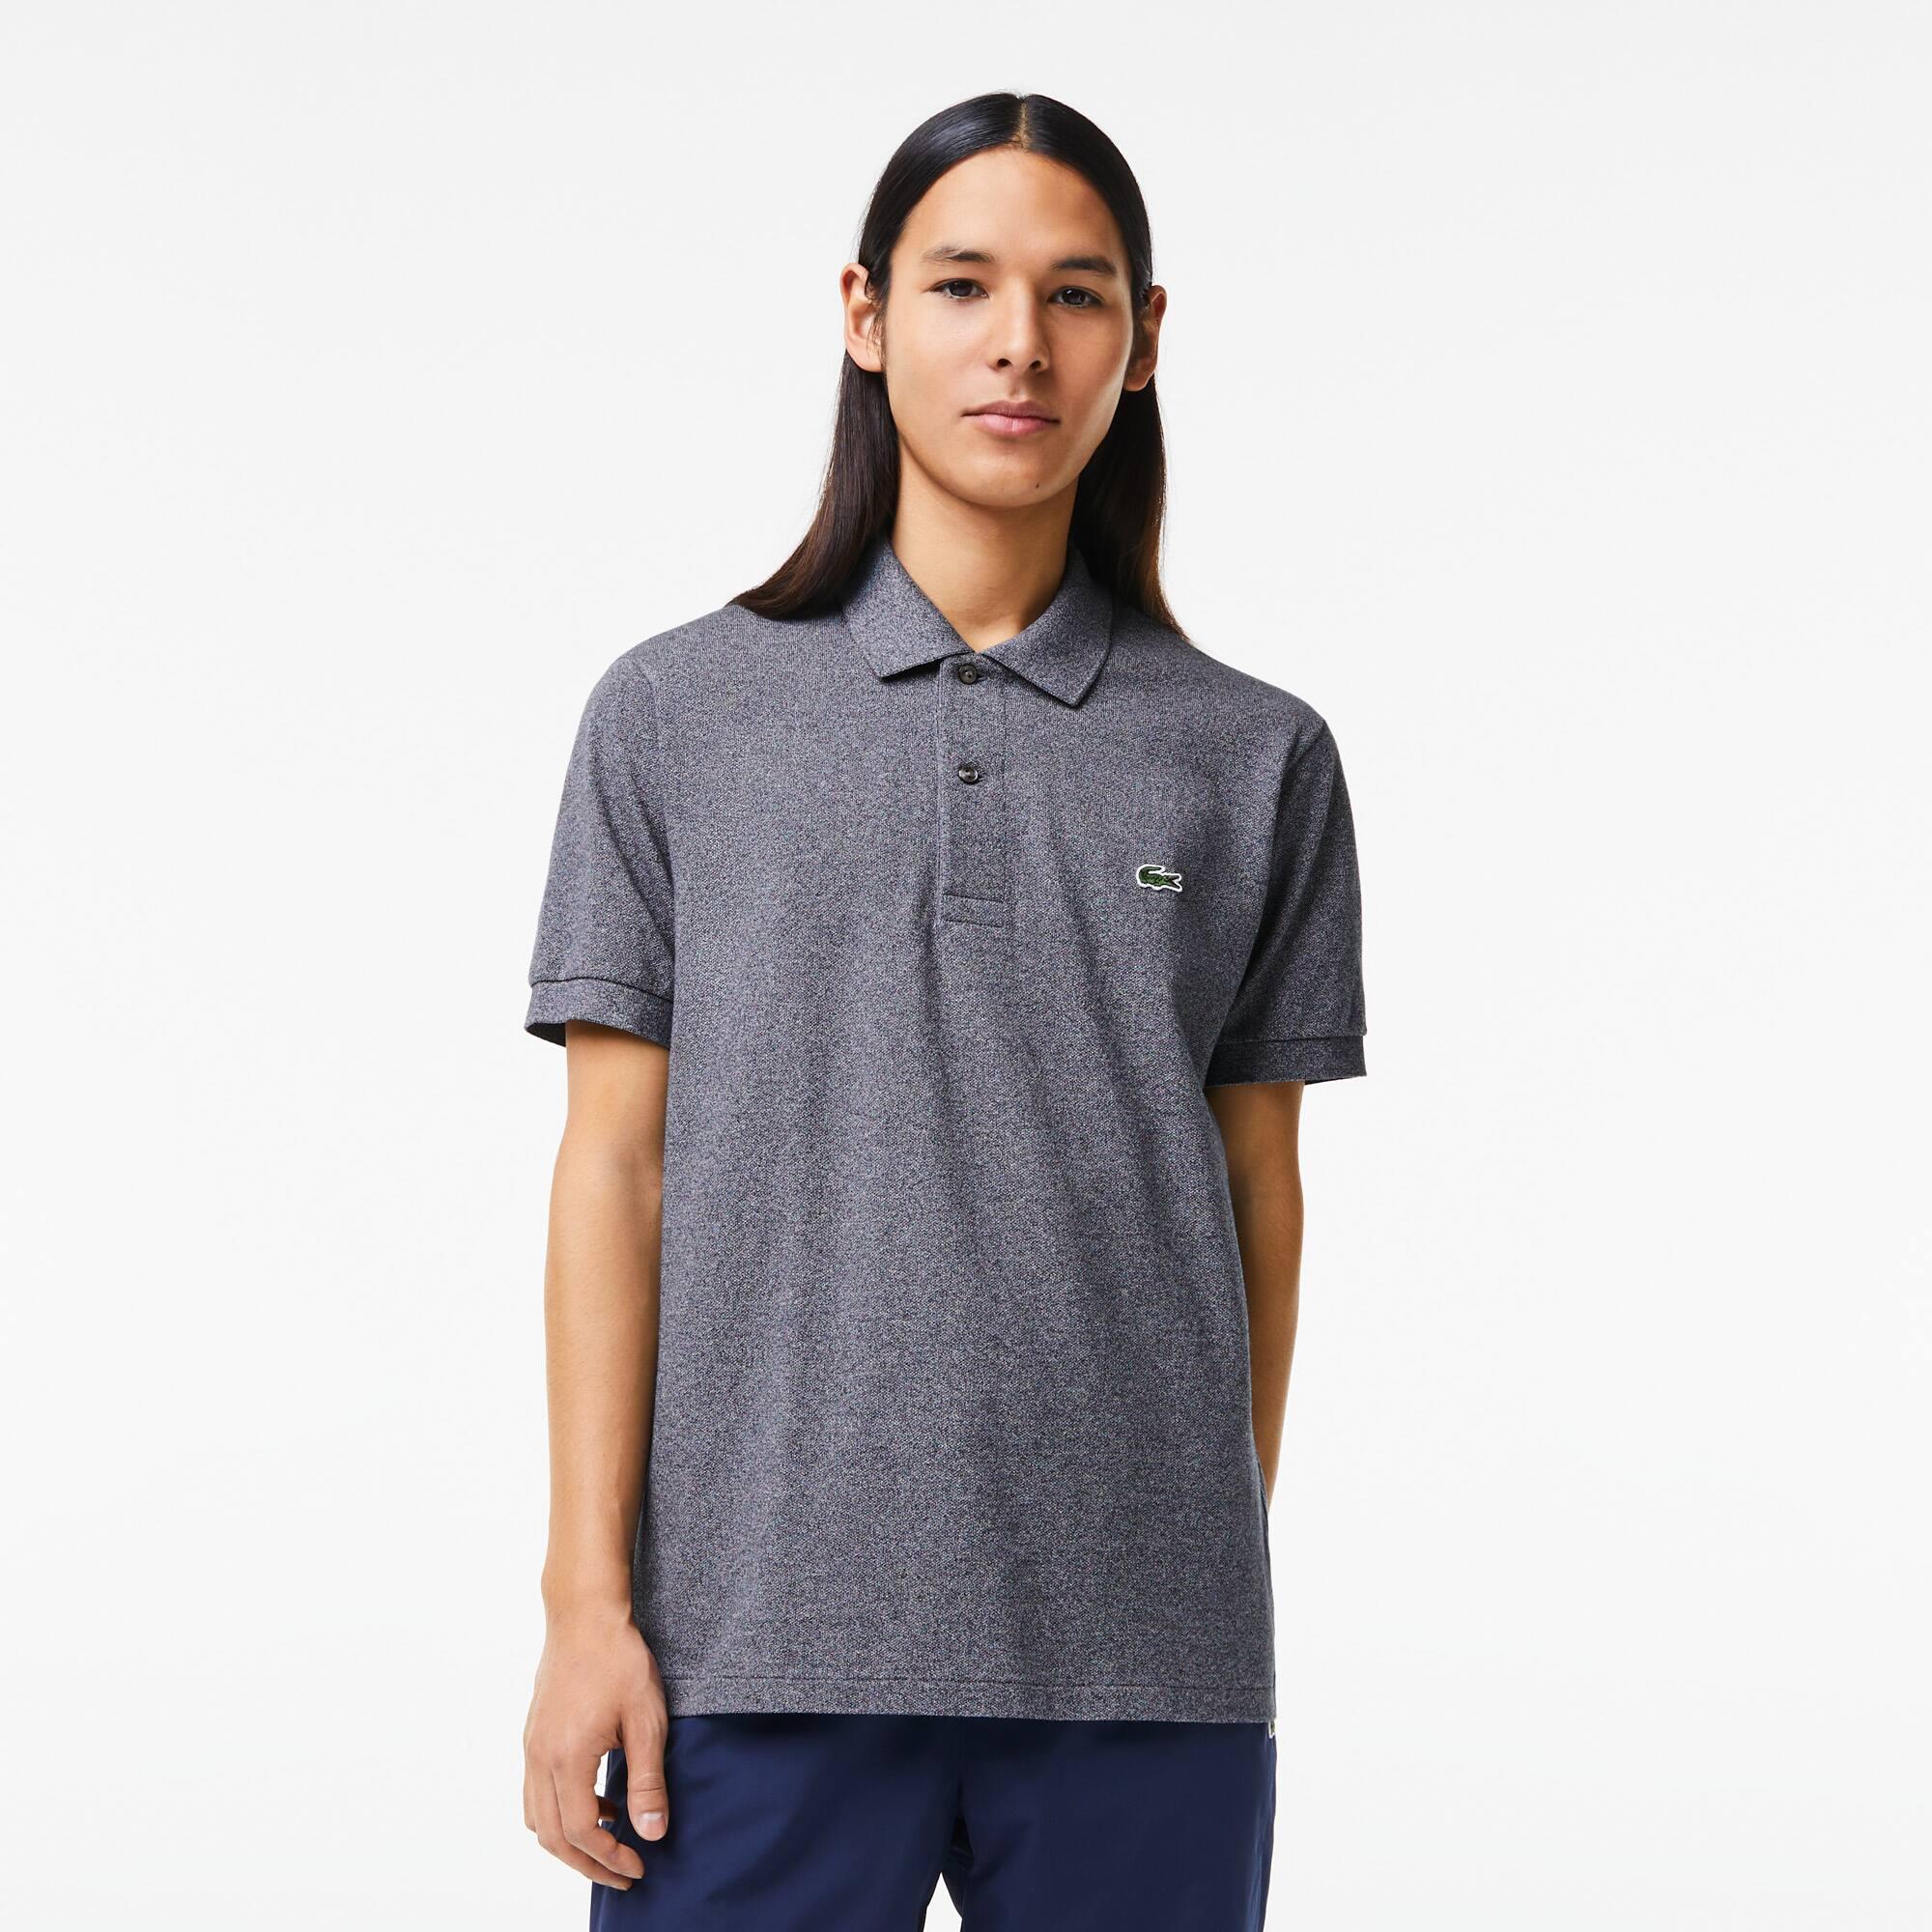 قميص بولو من مجموعة Lacoste L.12.12